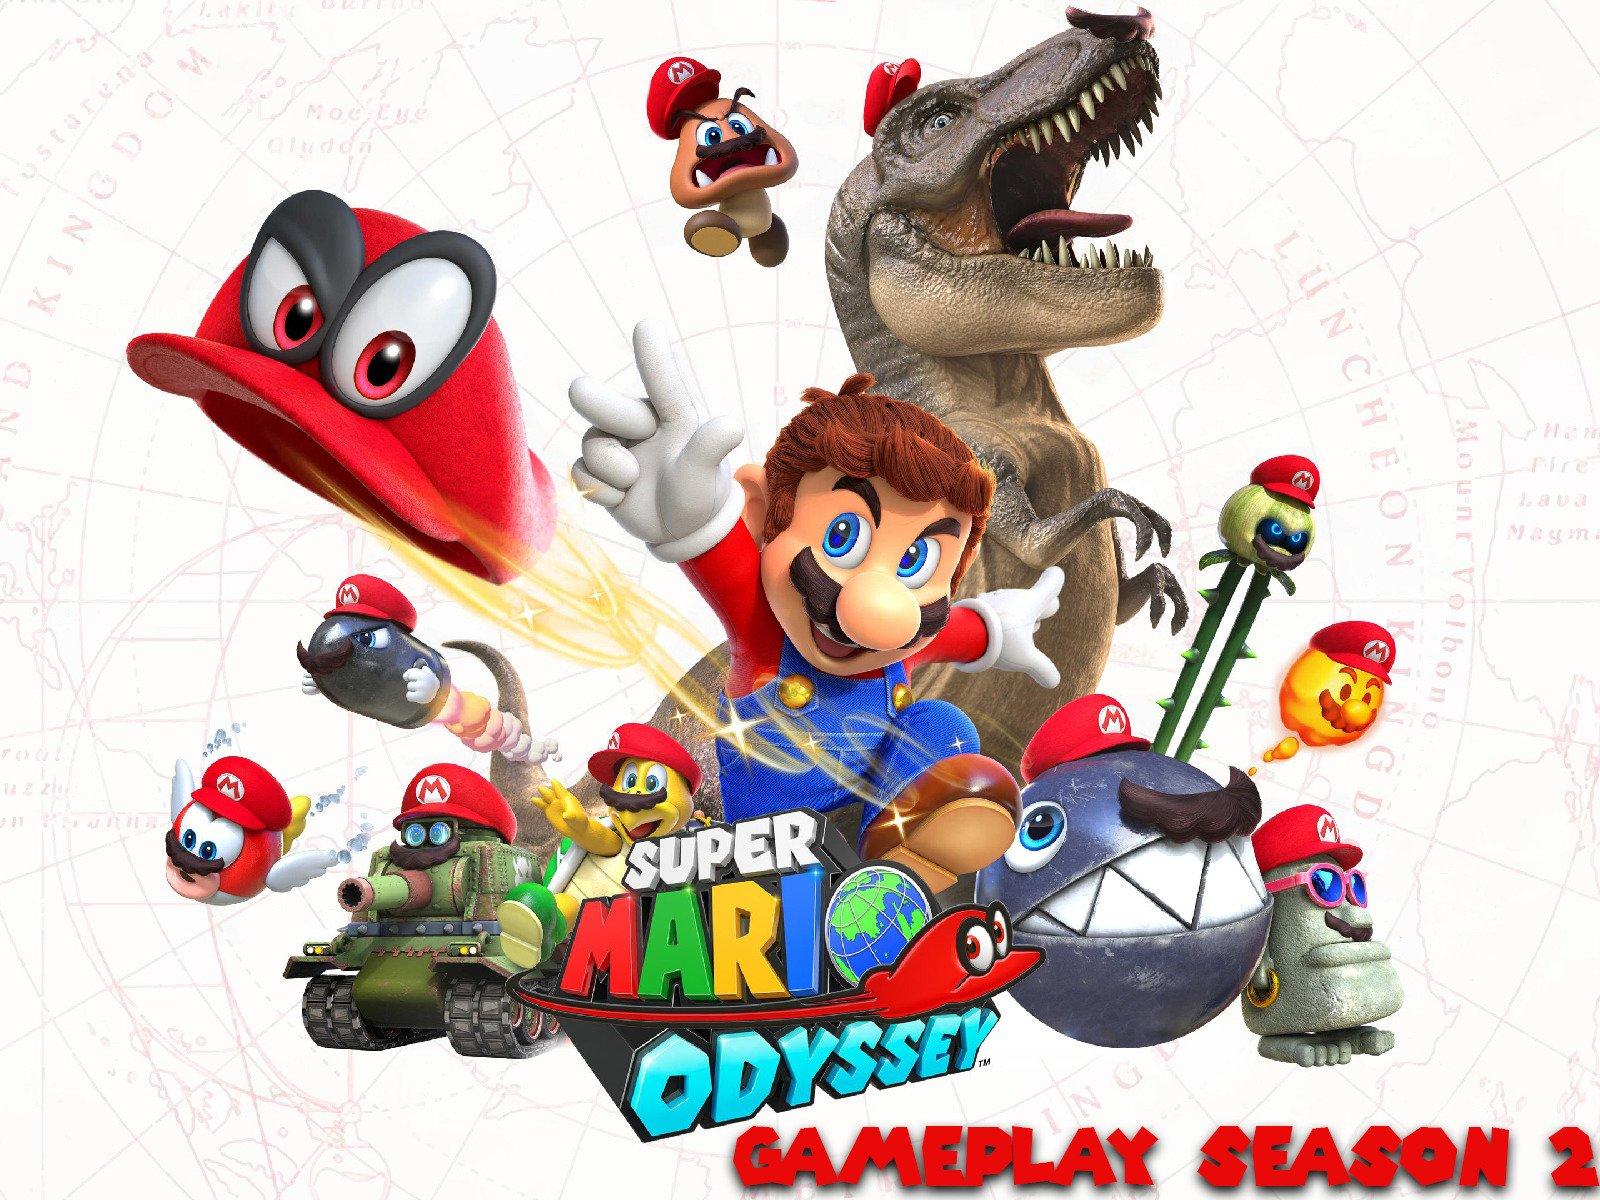 Clip: Super Mario Odyssey Gameplay